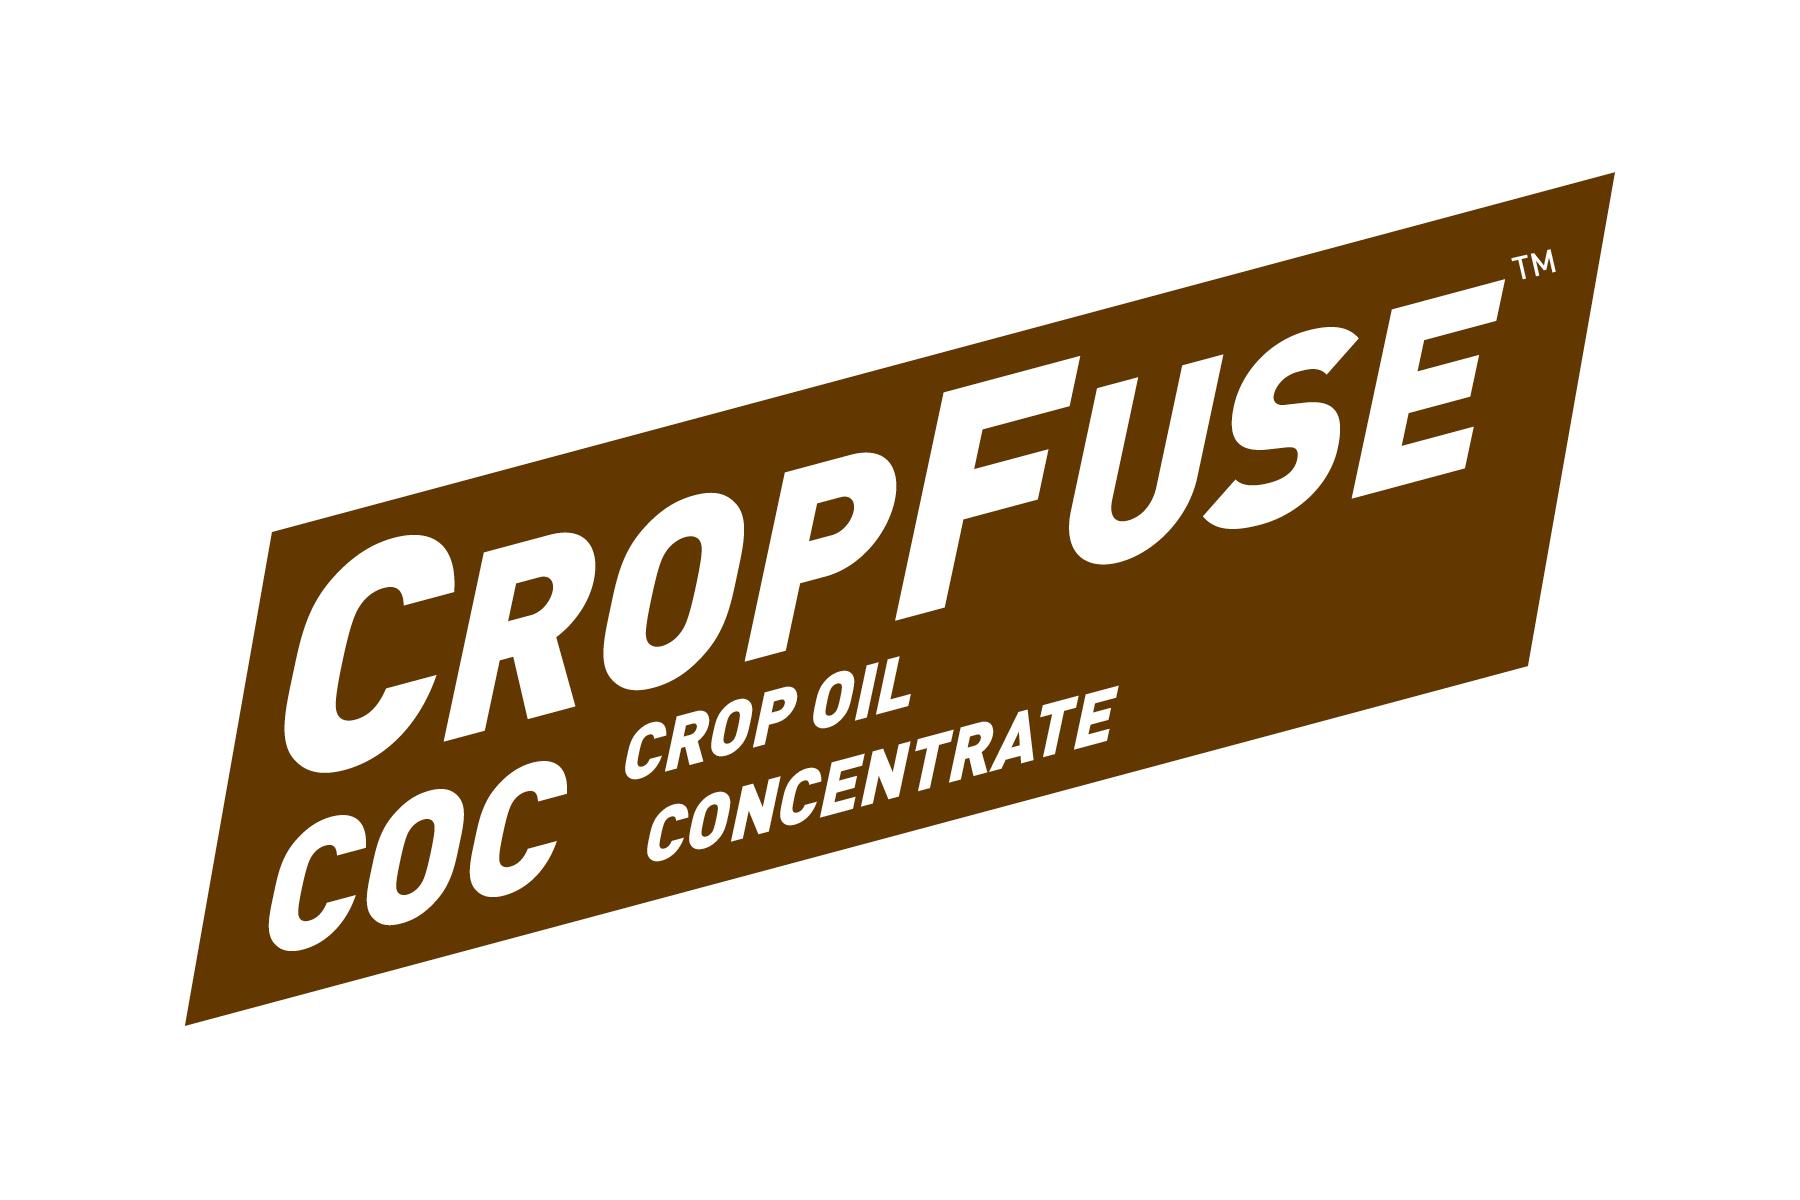 CROPFUSE™ COC